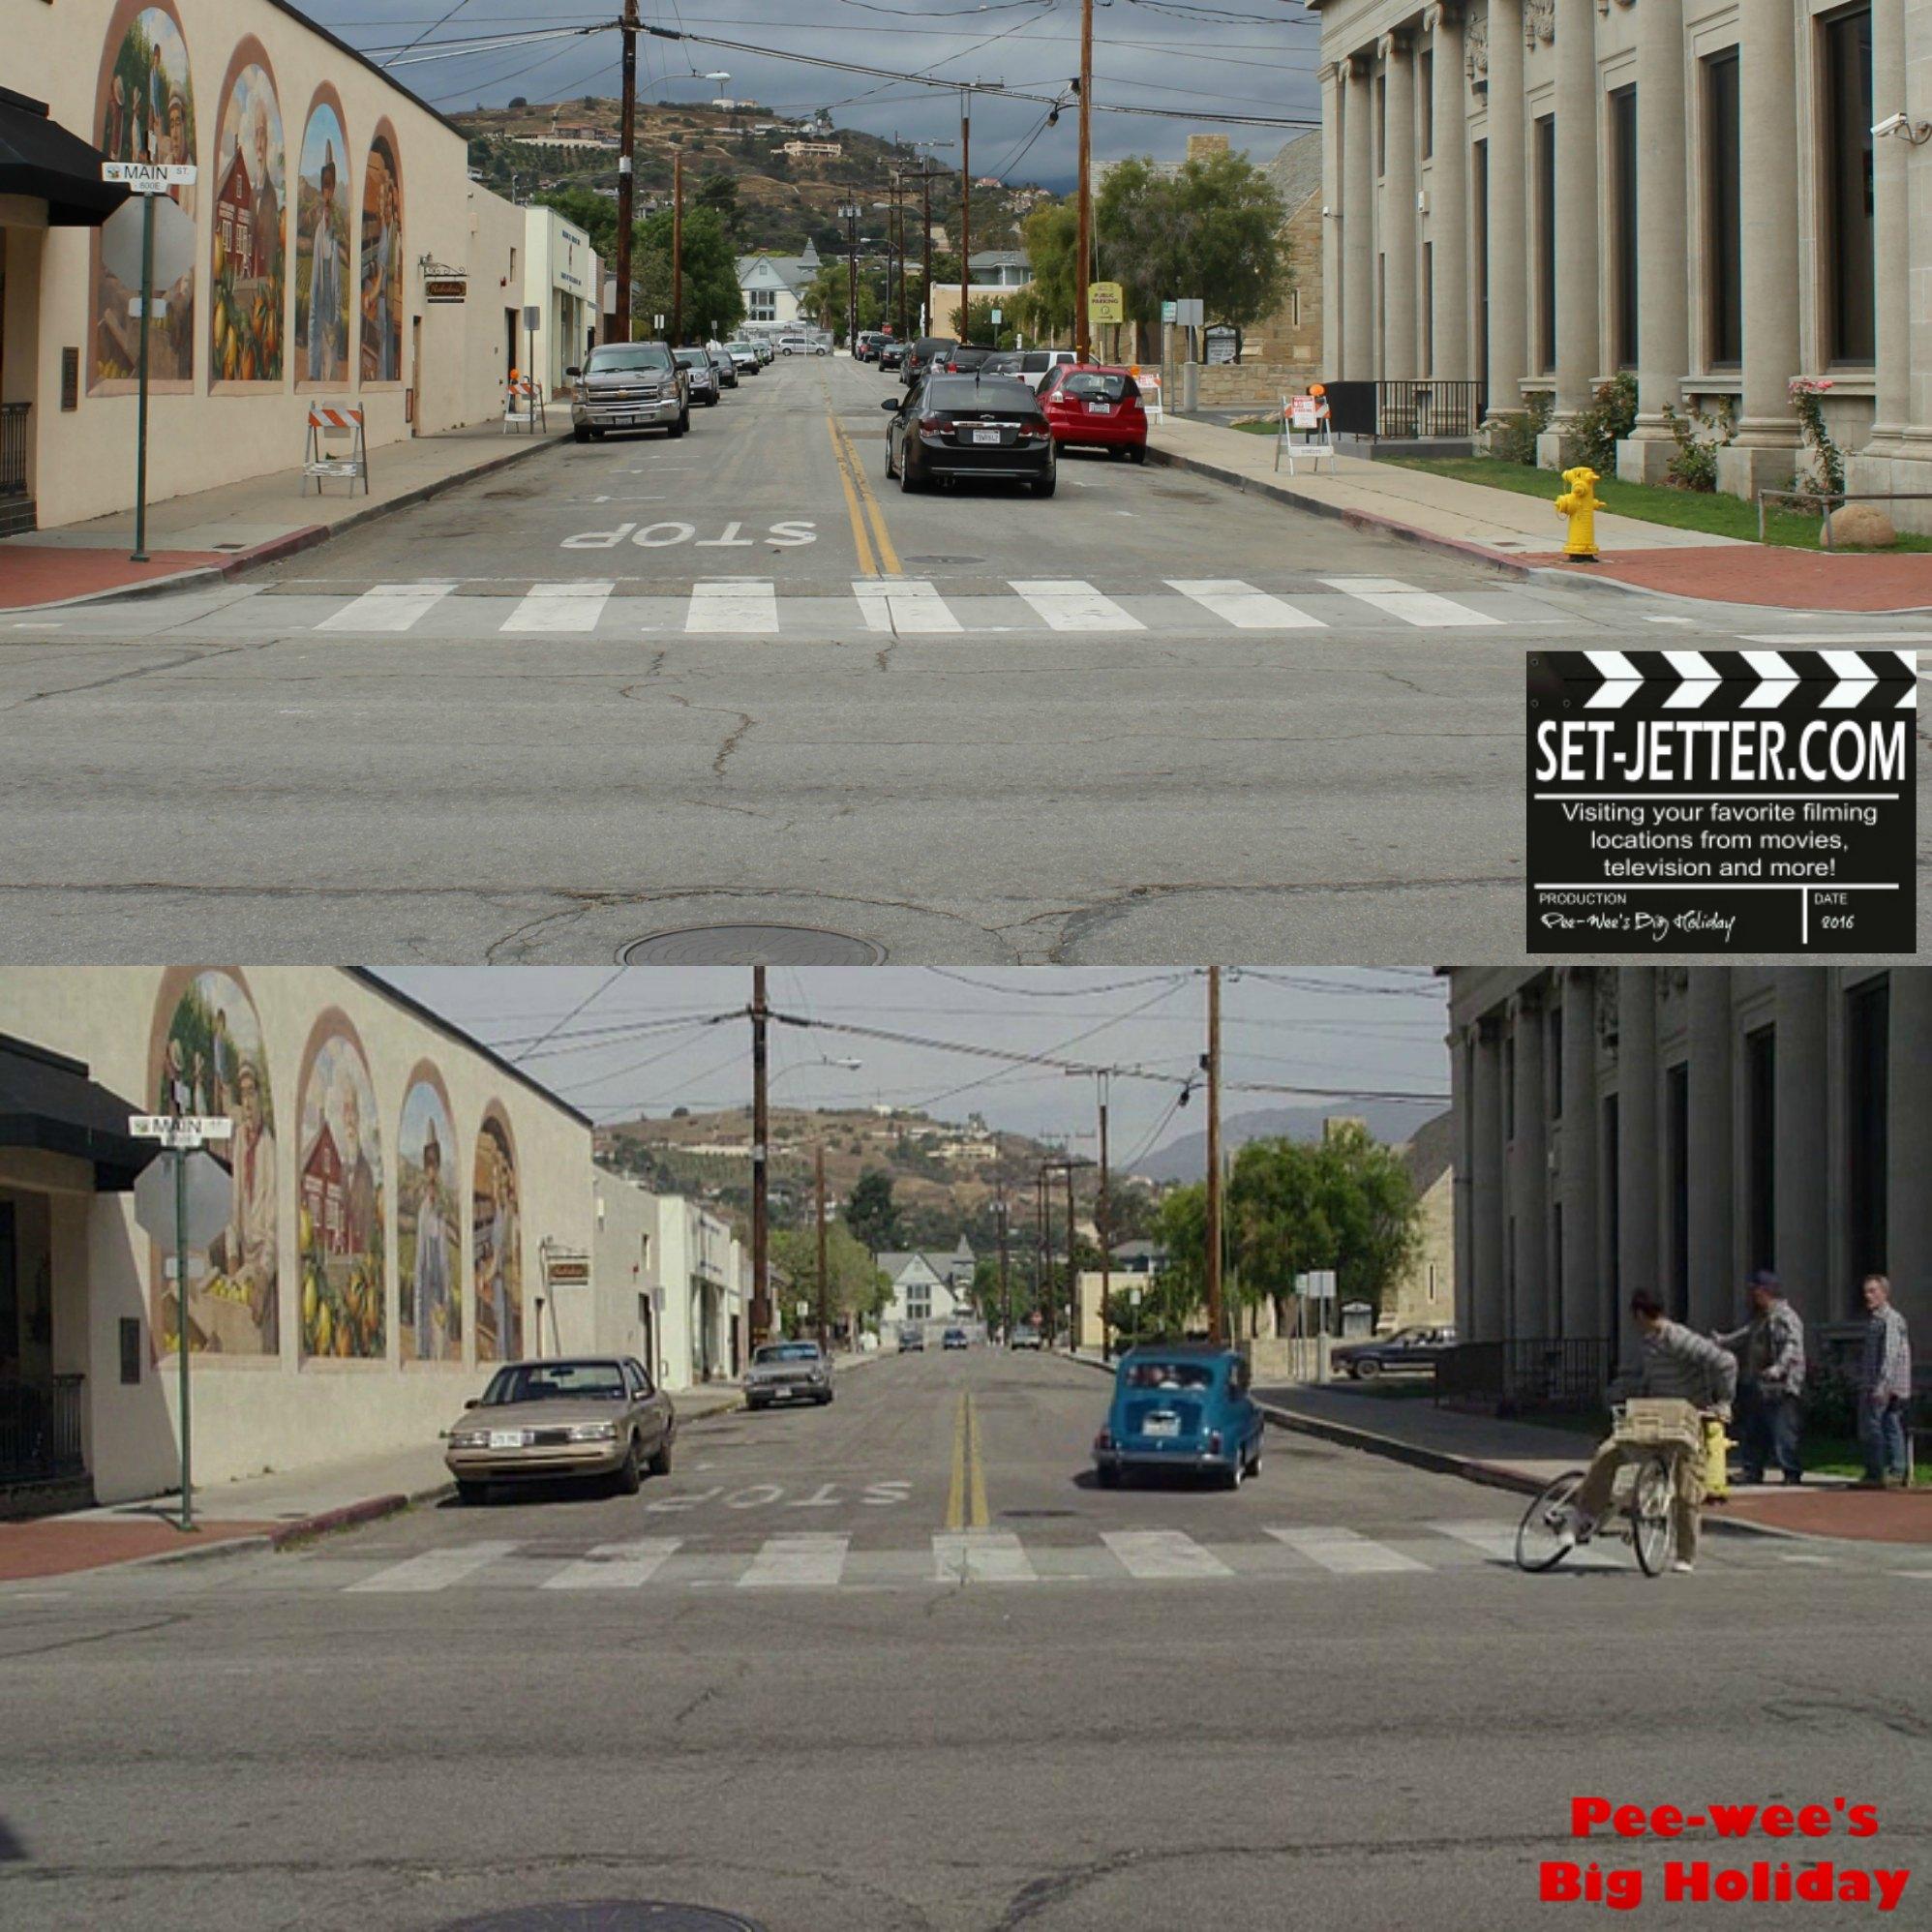 Pee Wee's Big Holiday comparison 352.jpg